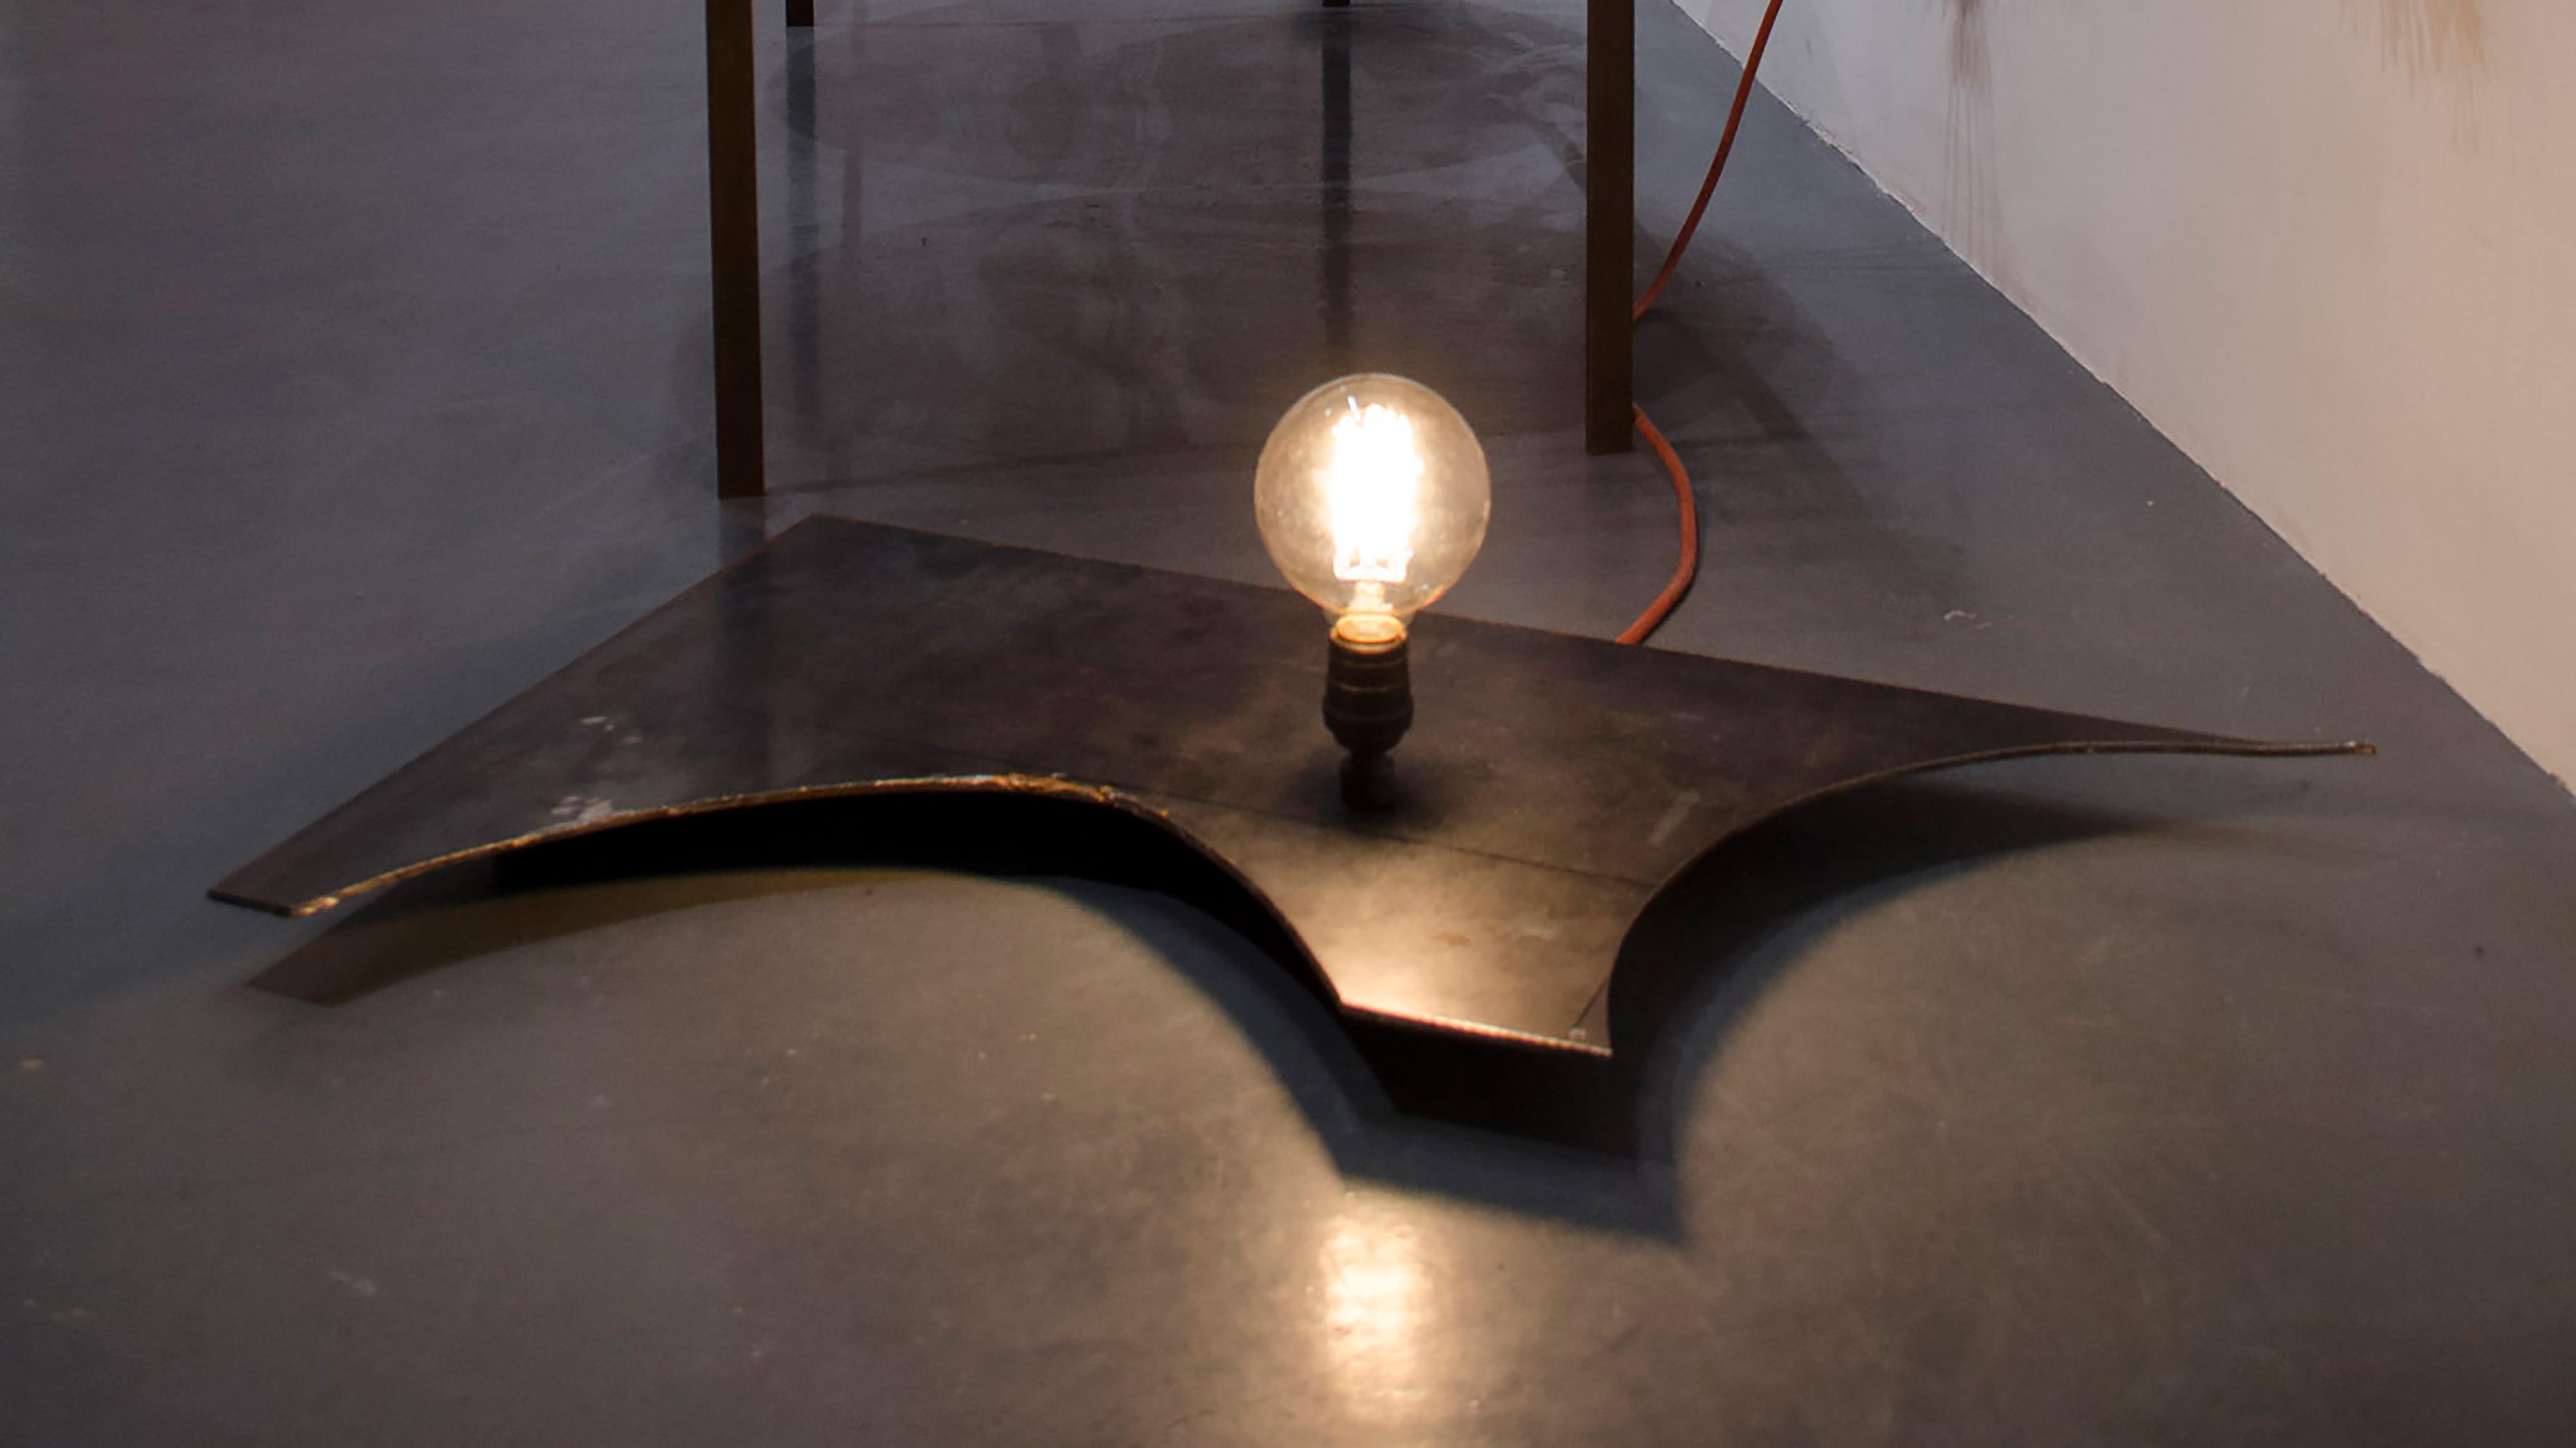 Galerie Barbara Thumm \ Sarah Entwistle: Flush (SEn-19-009) \ Flush (2019)